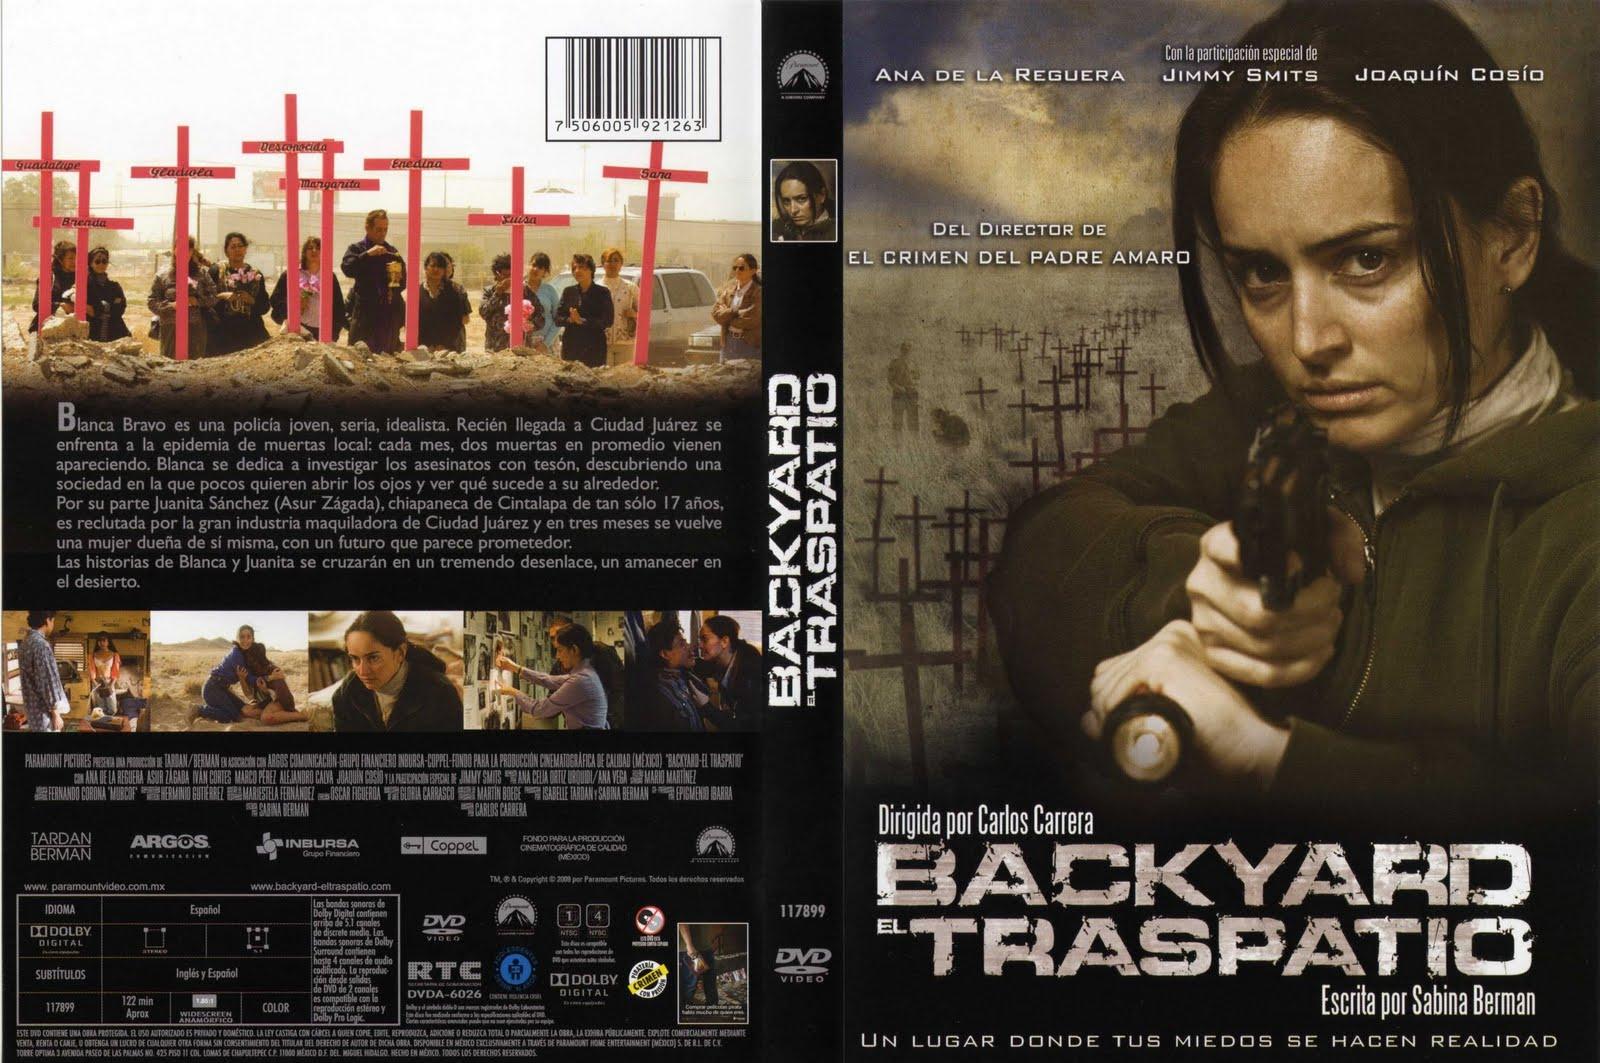 MANIA DIGITAL: Backyard: El Traspatio (2011)